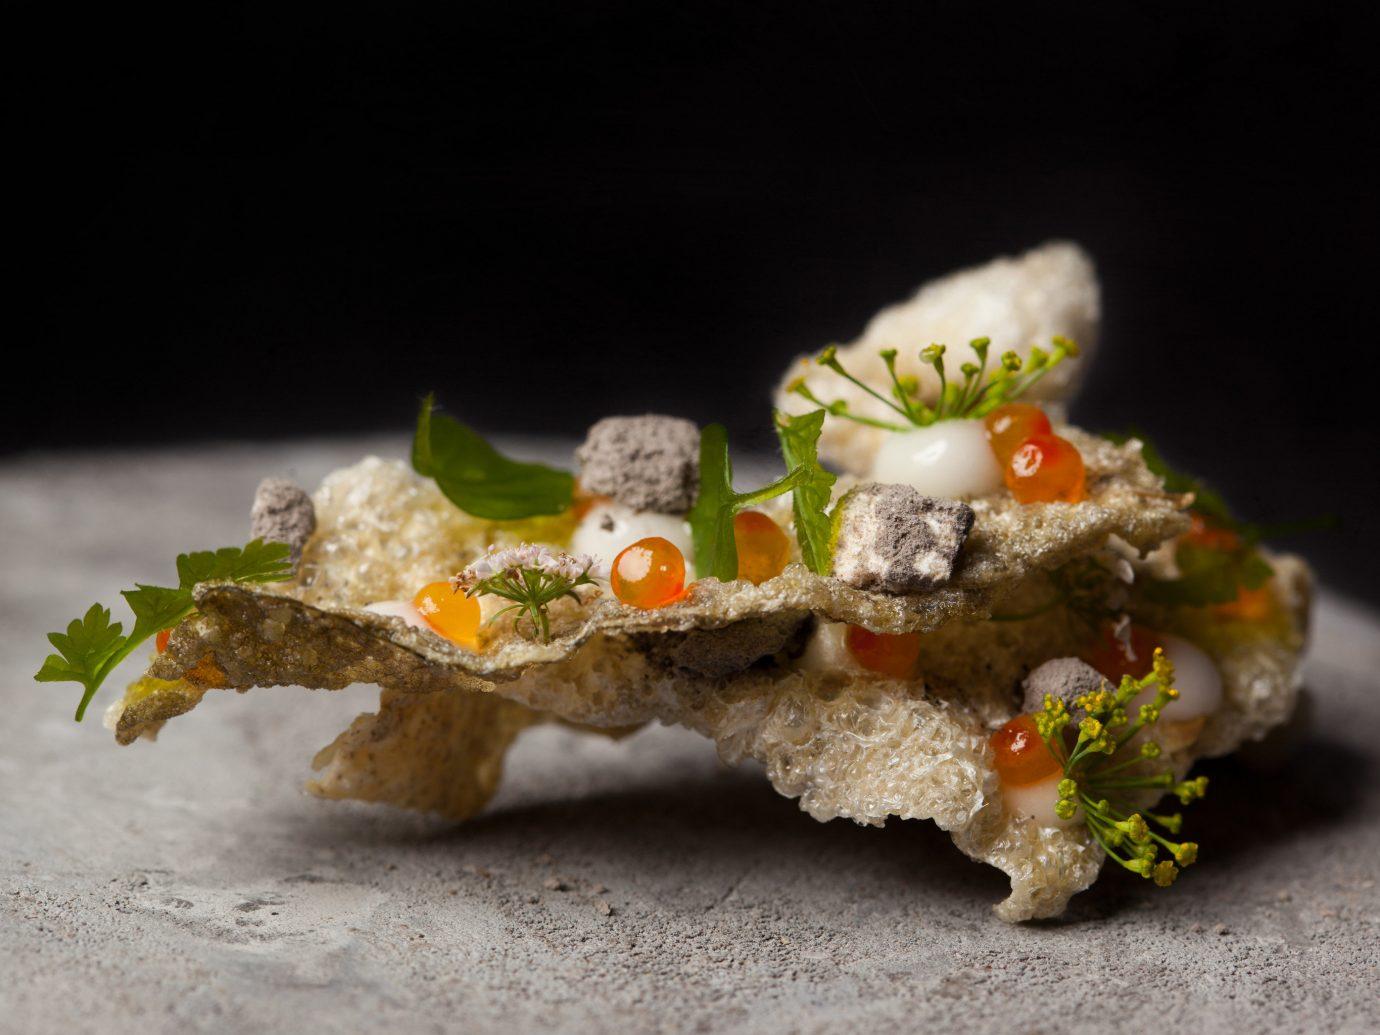 Food + Drink food piece dish sushi cuisine miniature produce macro photography slice